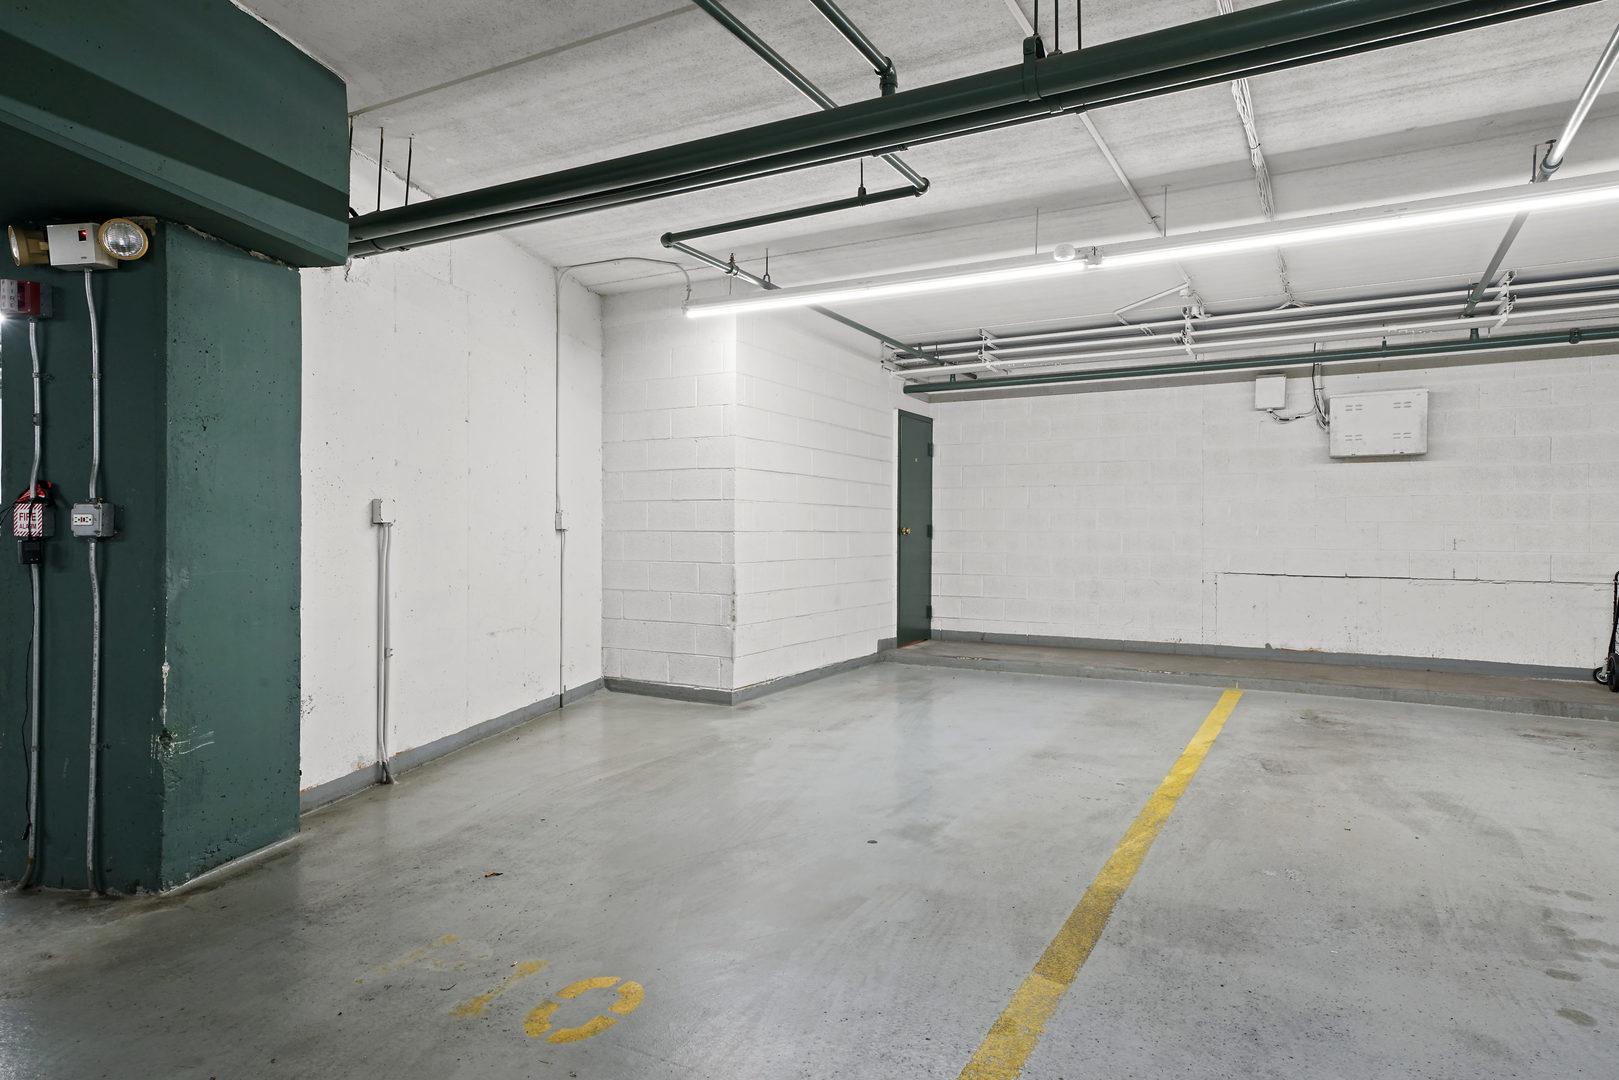 8580 Foster Avenue, Norridge, Illinois 60706, 2 Bedrooms Bedrooms, ,2 BathroomsBathrooms,Residential,For Sale,Foster,MRD11151431